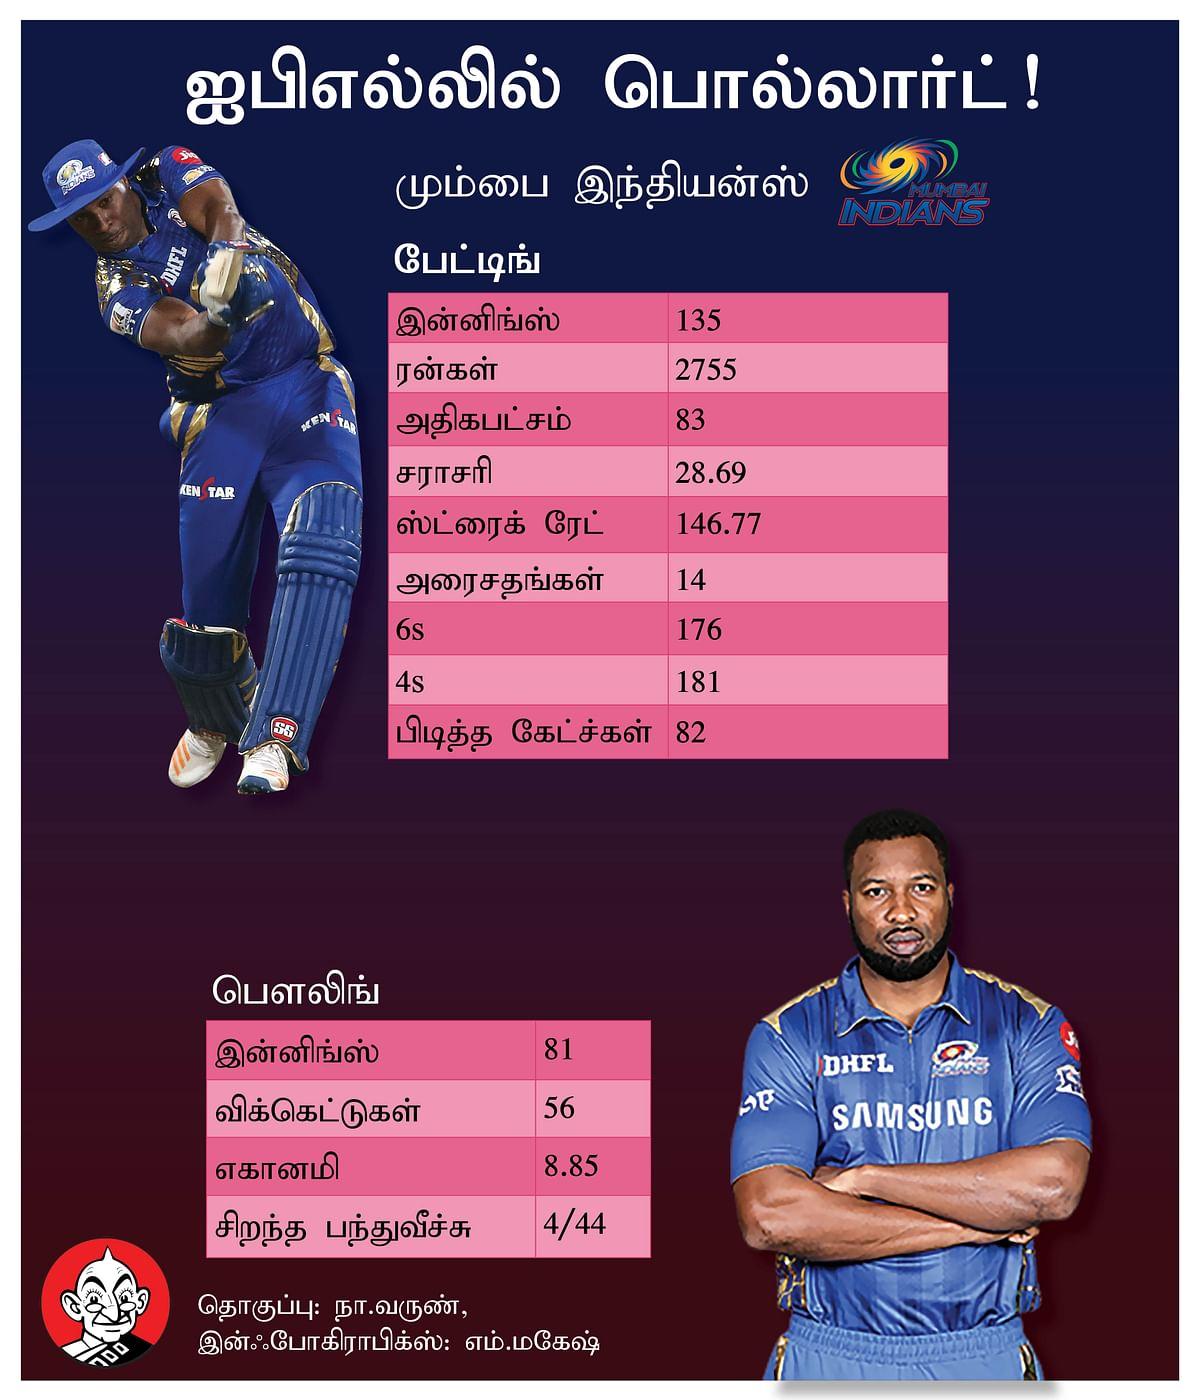 Pollard in IPL